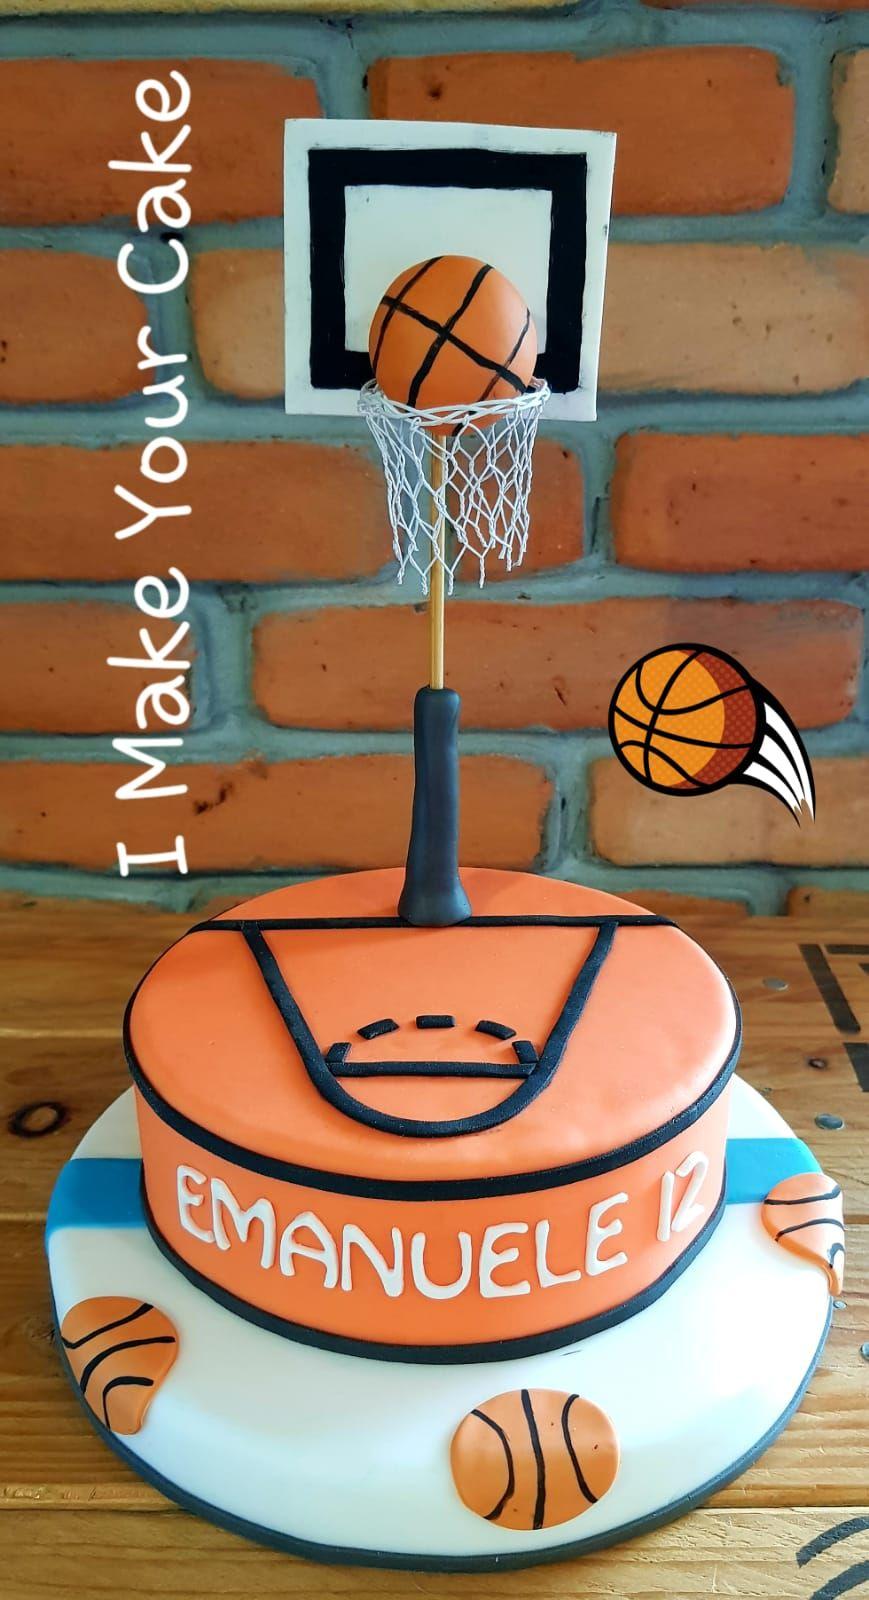 cake design basketball Basket  Geburtstagskuchen ideen, Kuchen, Geburtstagskuchen